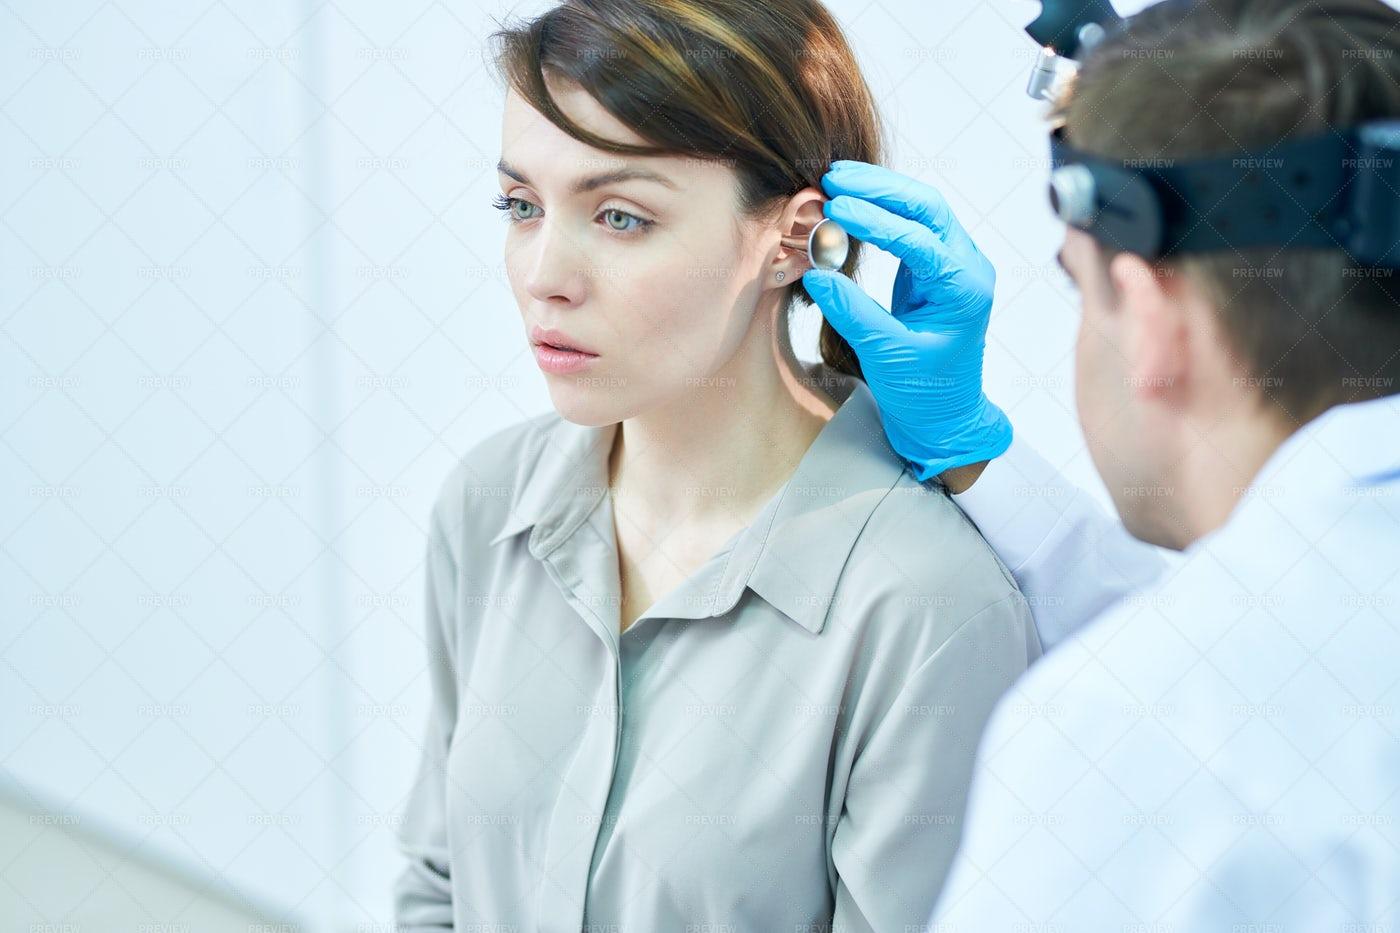 Audiologist Examining Hearing: Stock Photos